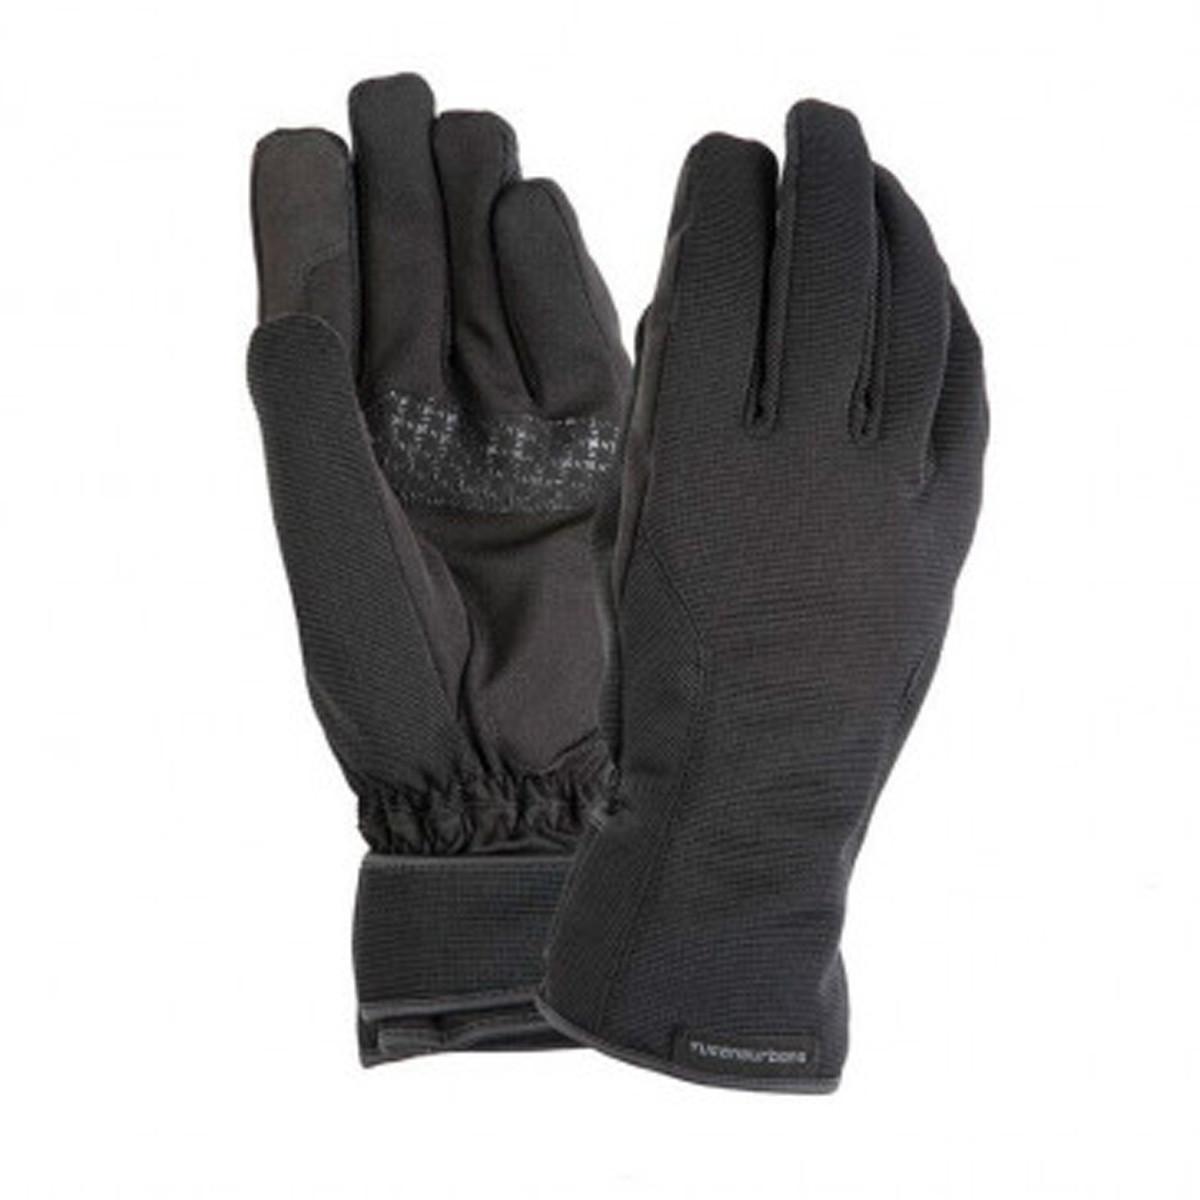 Gants Moto - Tucano Monty touch Hiver Noir